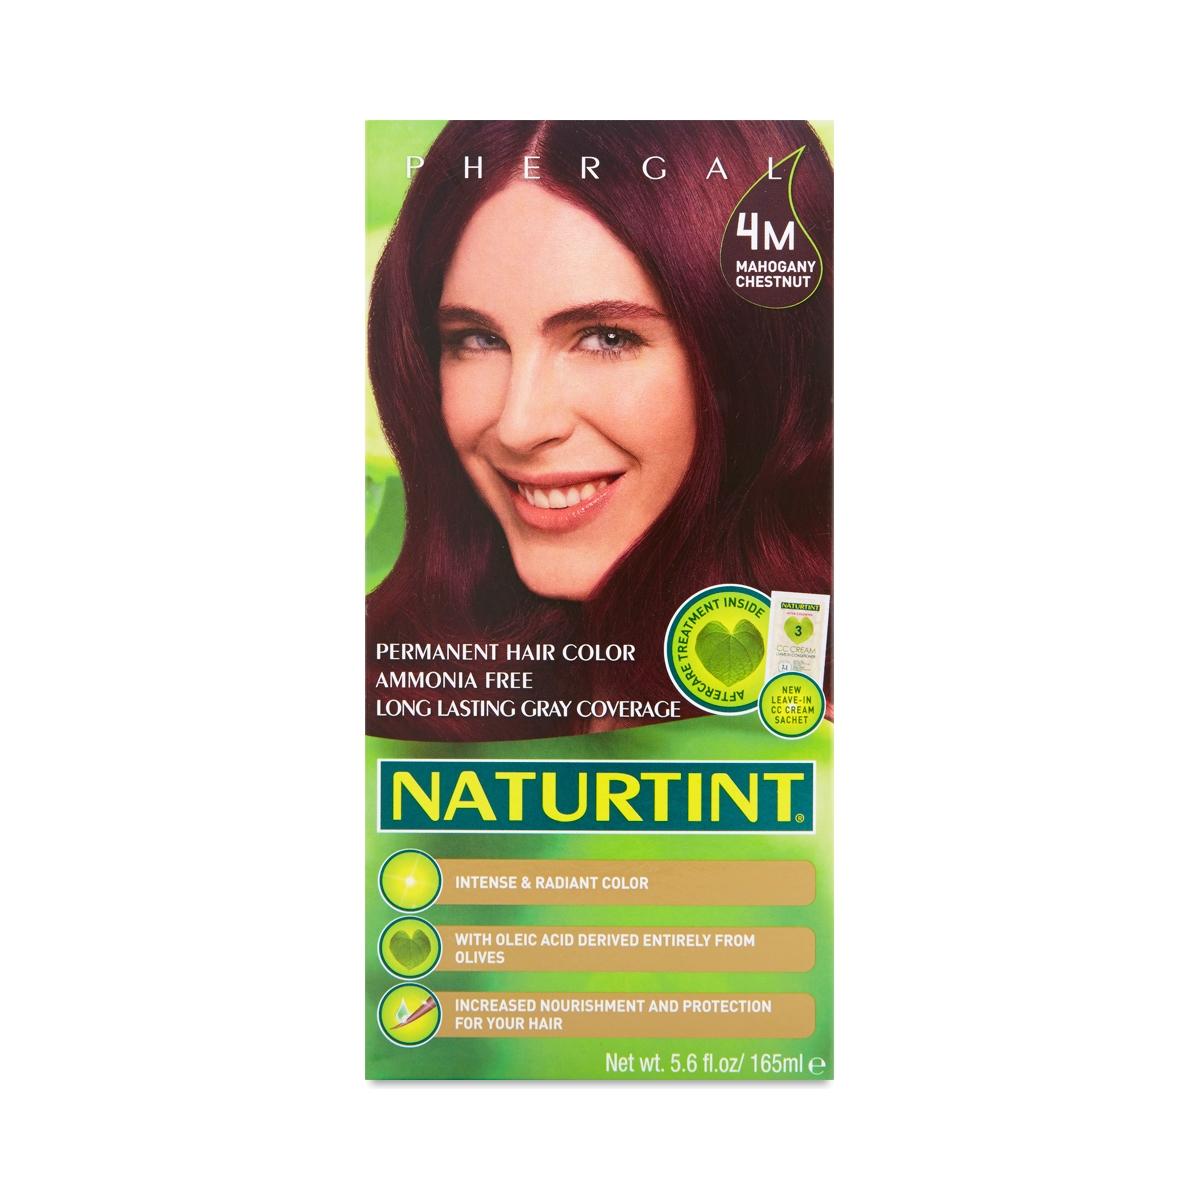 Mahogany Chestnut 4m Permanent Hair Color Thrive Market